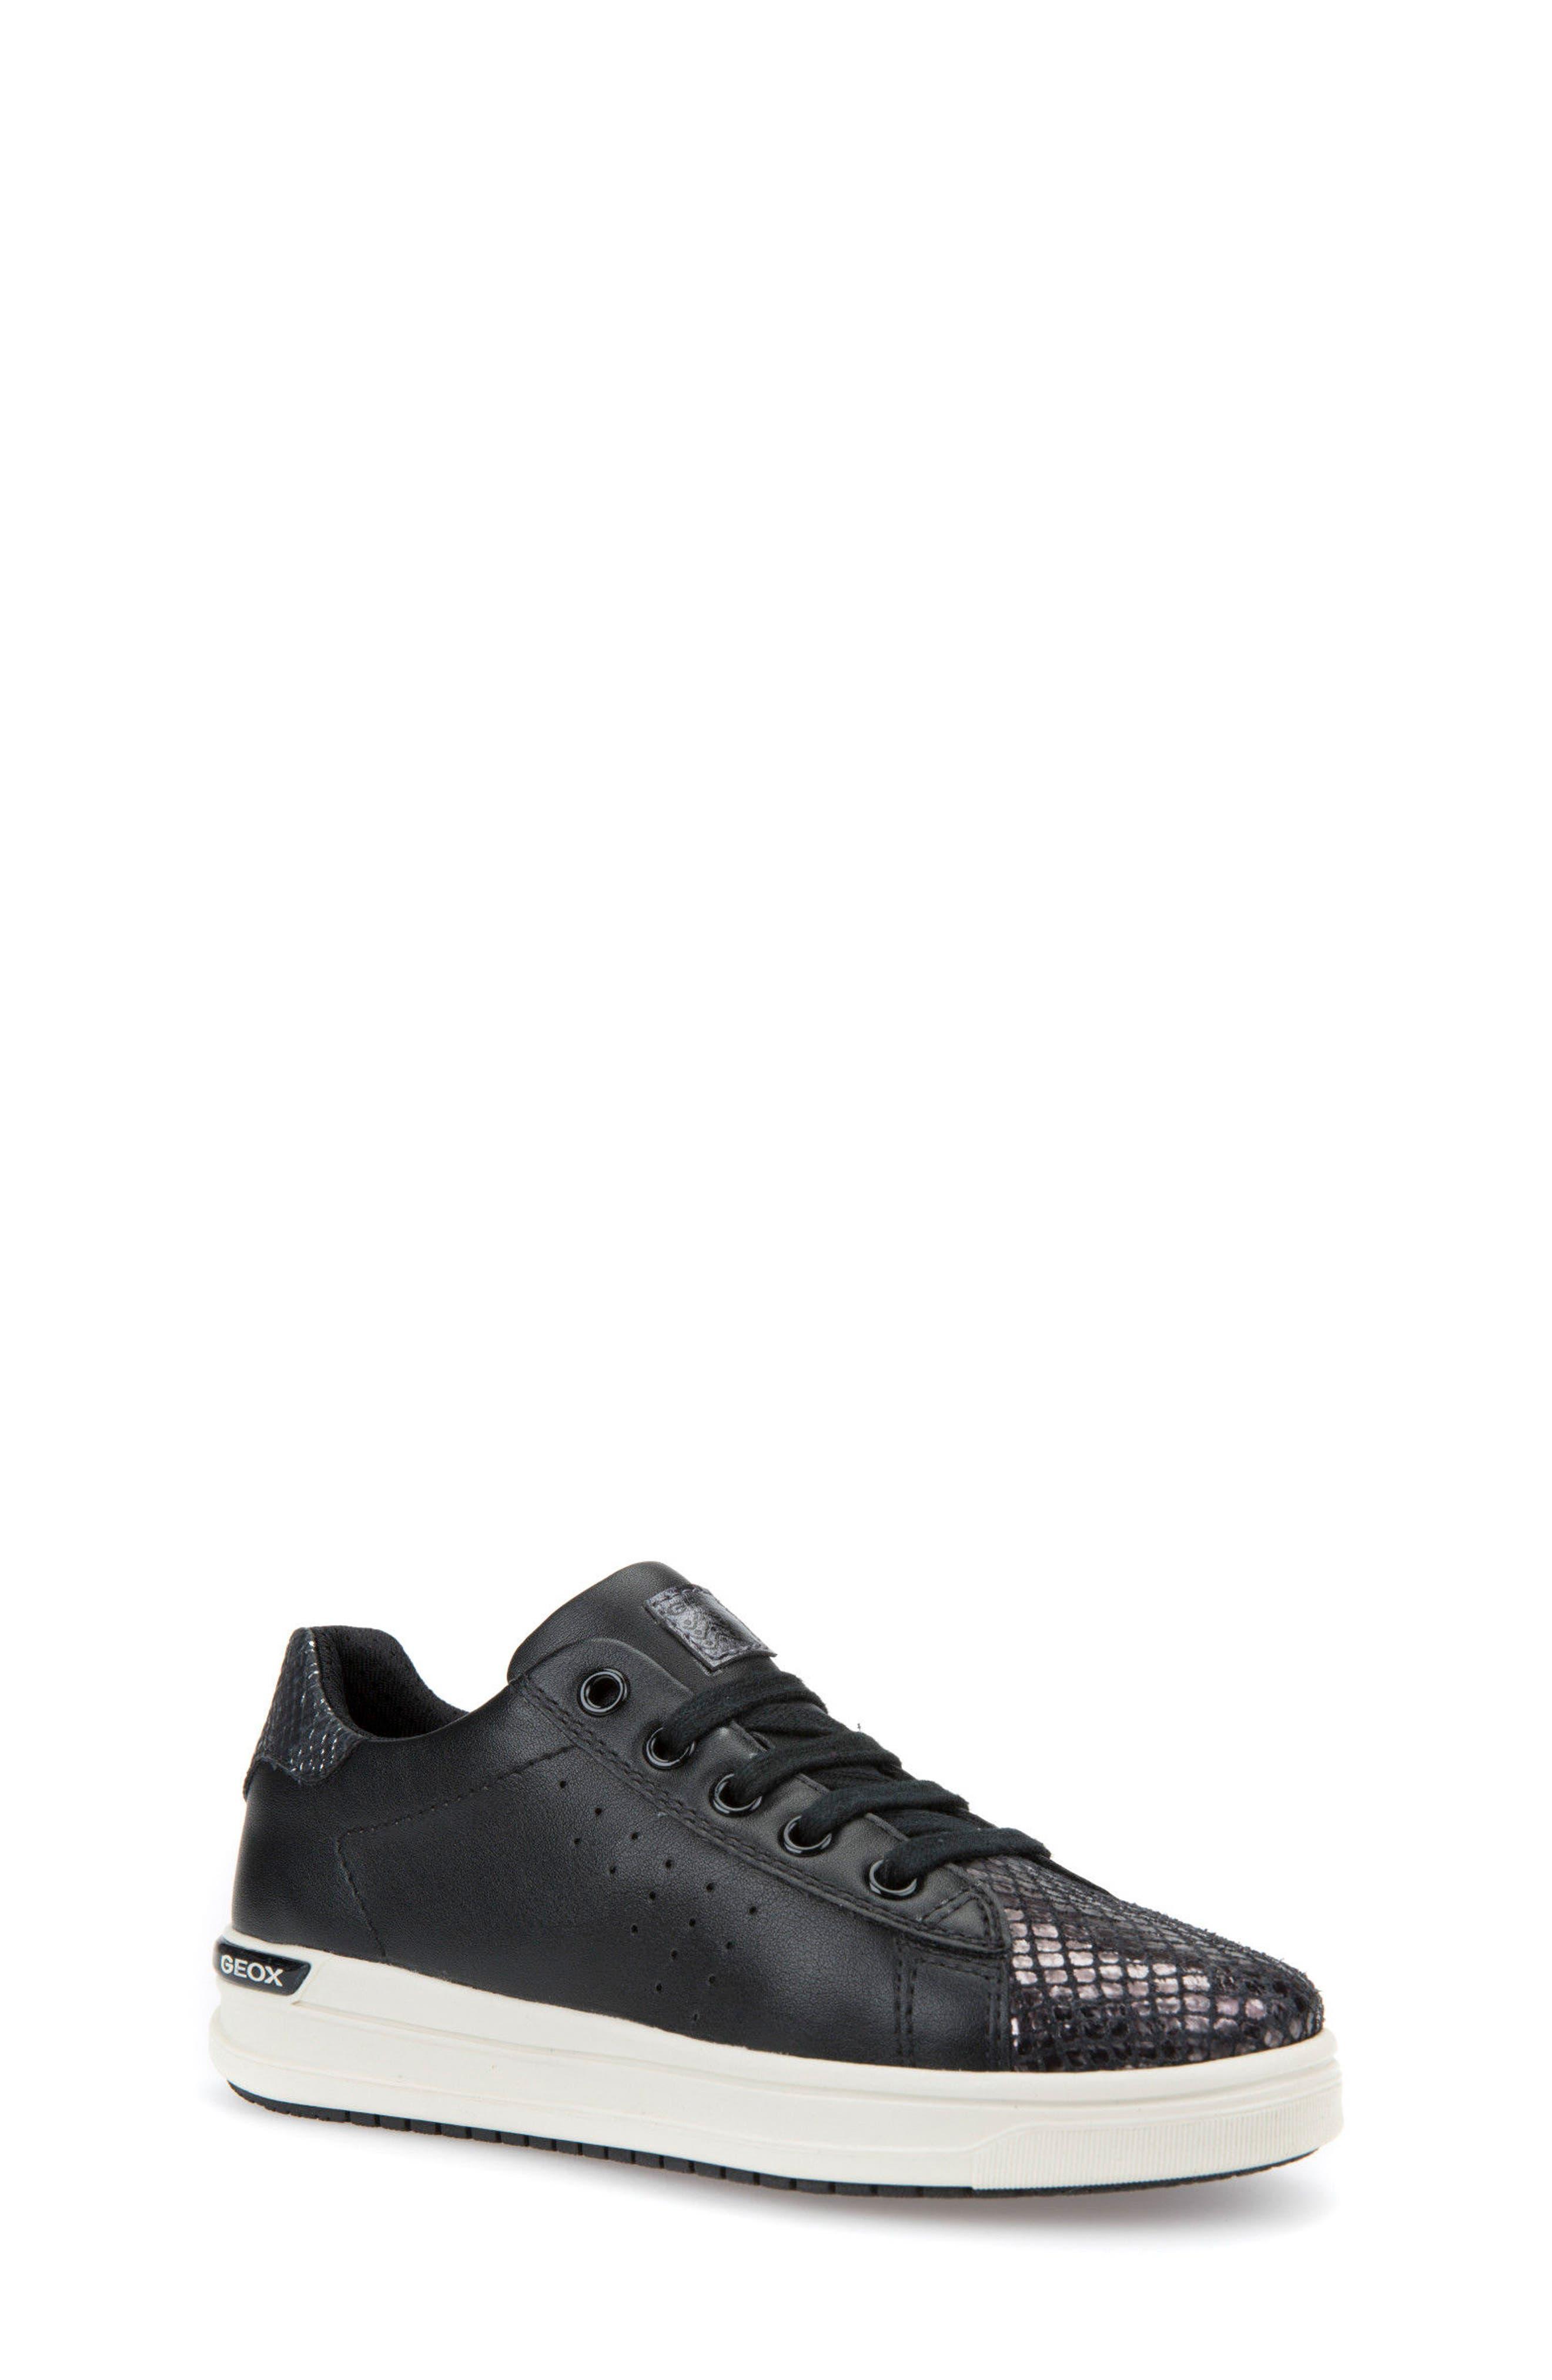 Cave Up Girl Low Top Sneaker,                             Main thumbnail 1, color,                             Black